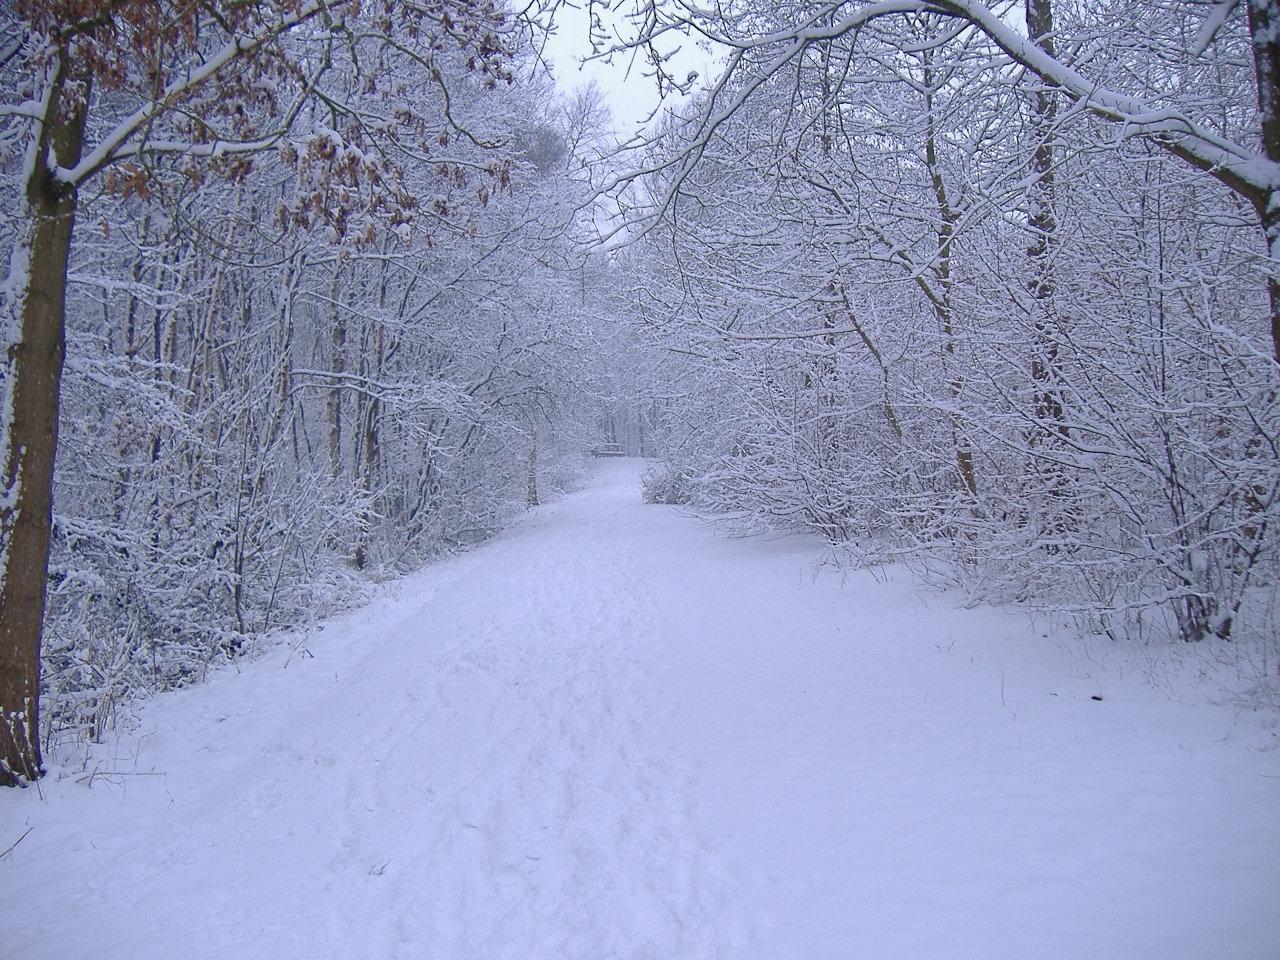 48] Winter Wallpaper Scenes on WallpaperSafari 1280x960